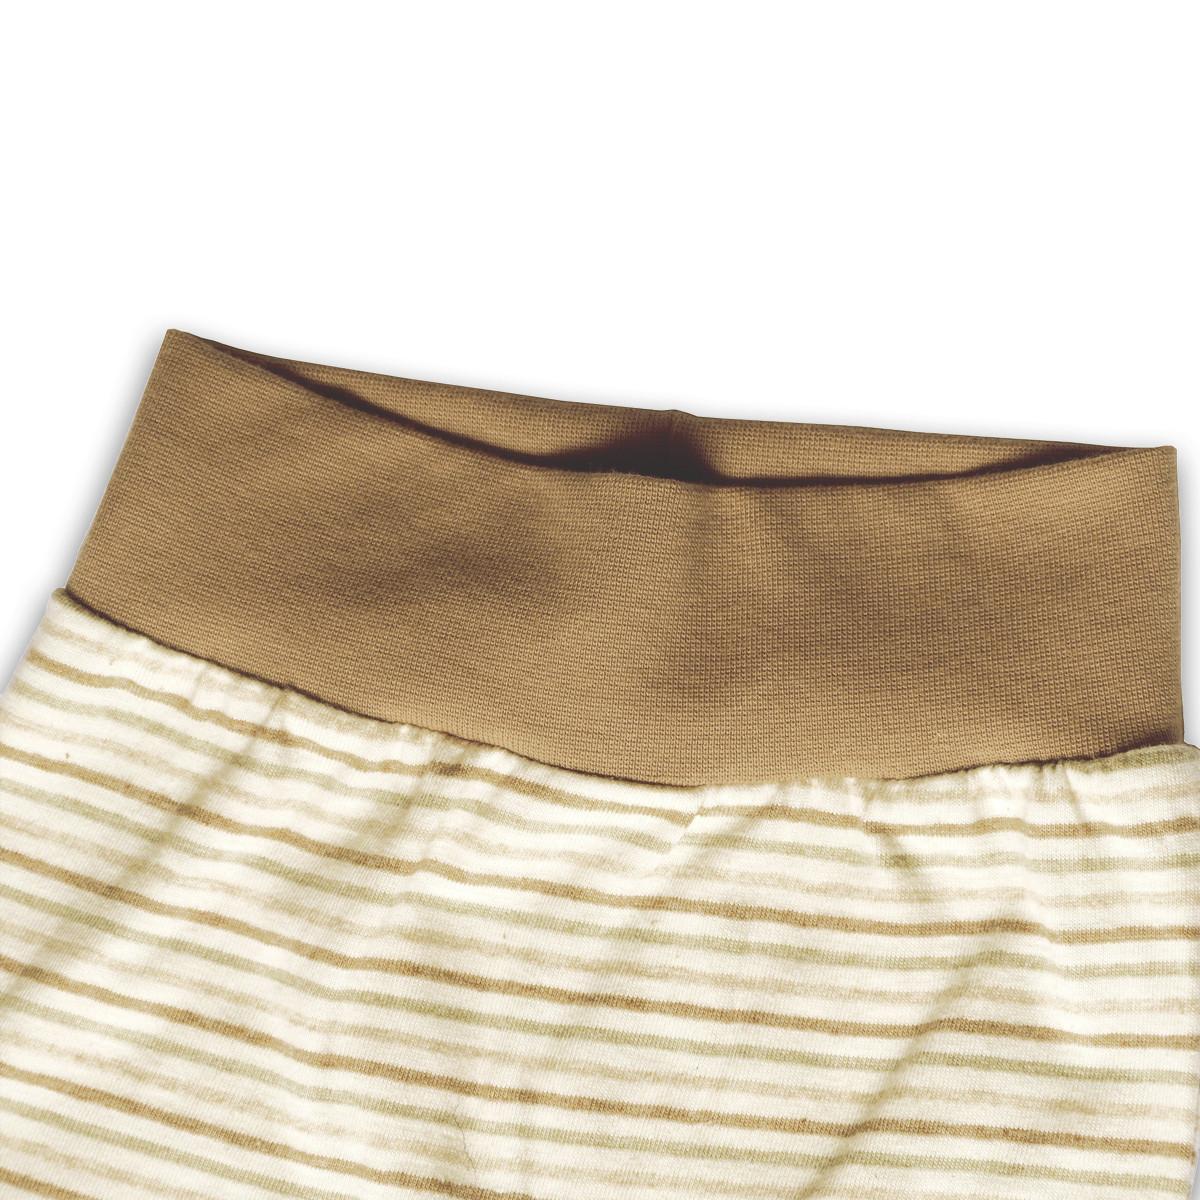 b51c8f95fc Babyhose mit Fuß aus naturfarbener Baumwolle | mama-ocllo.com